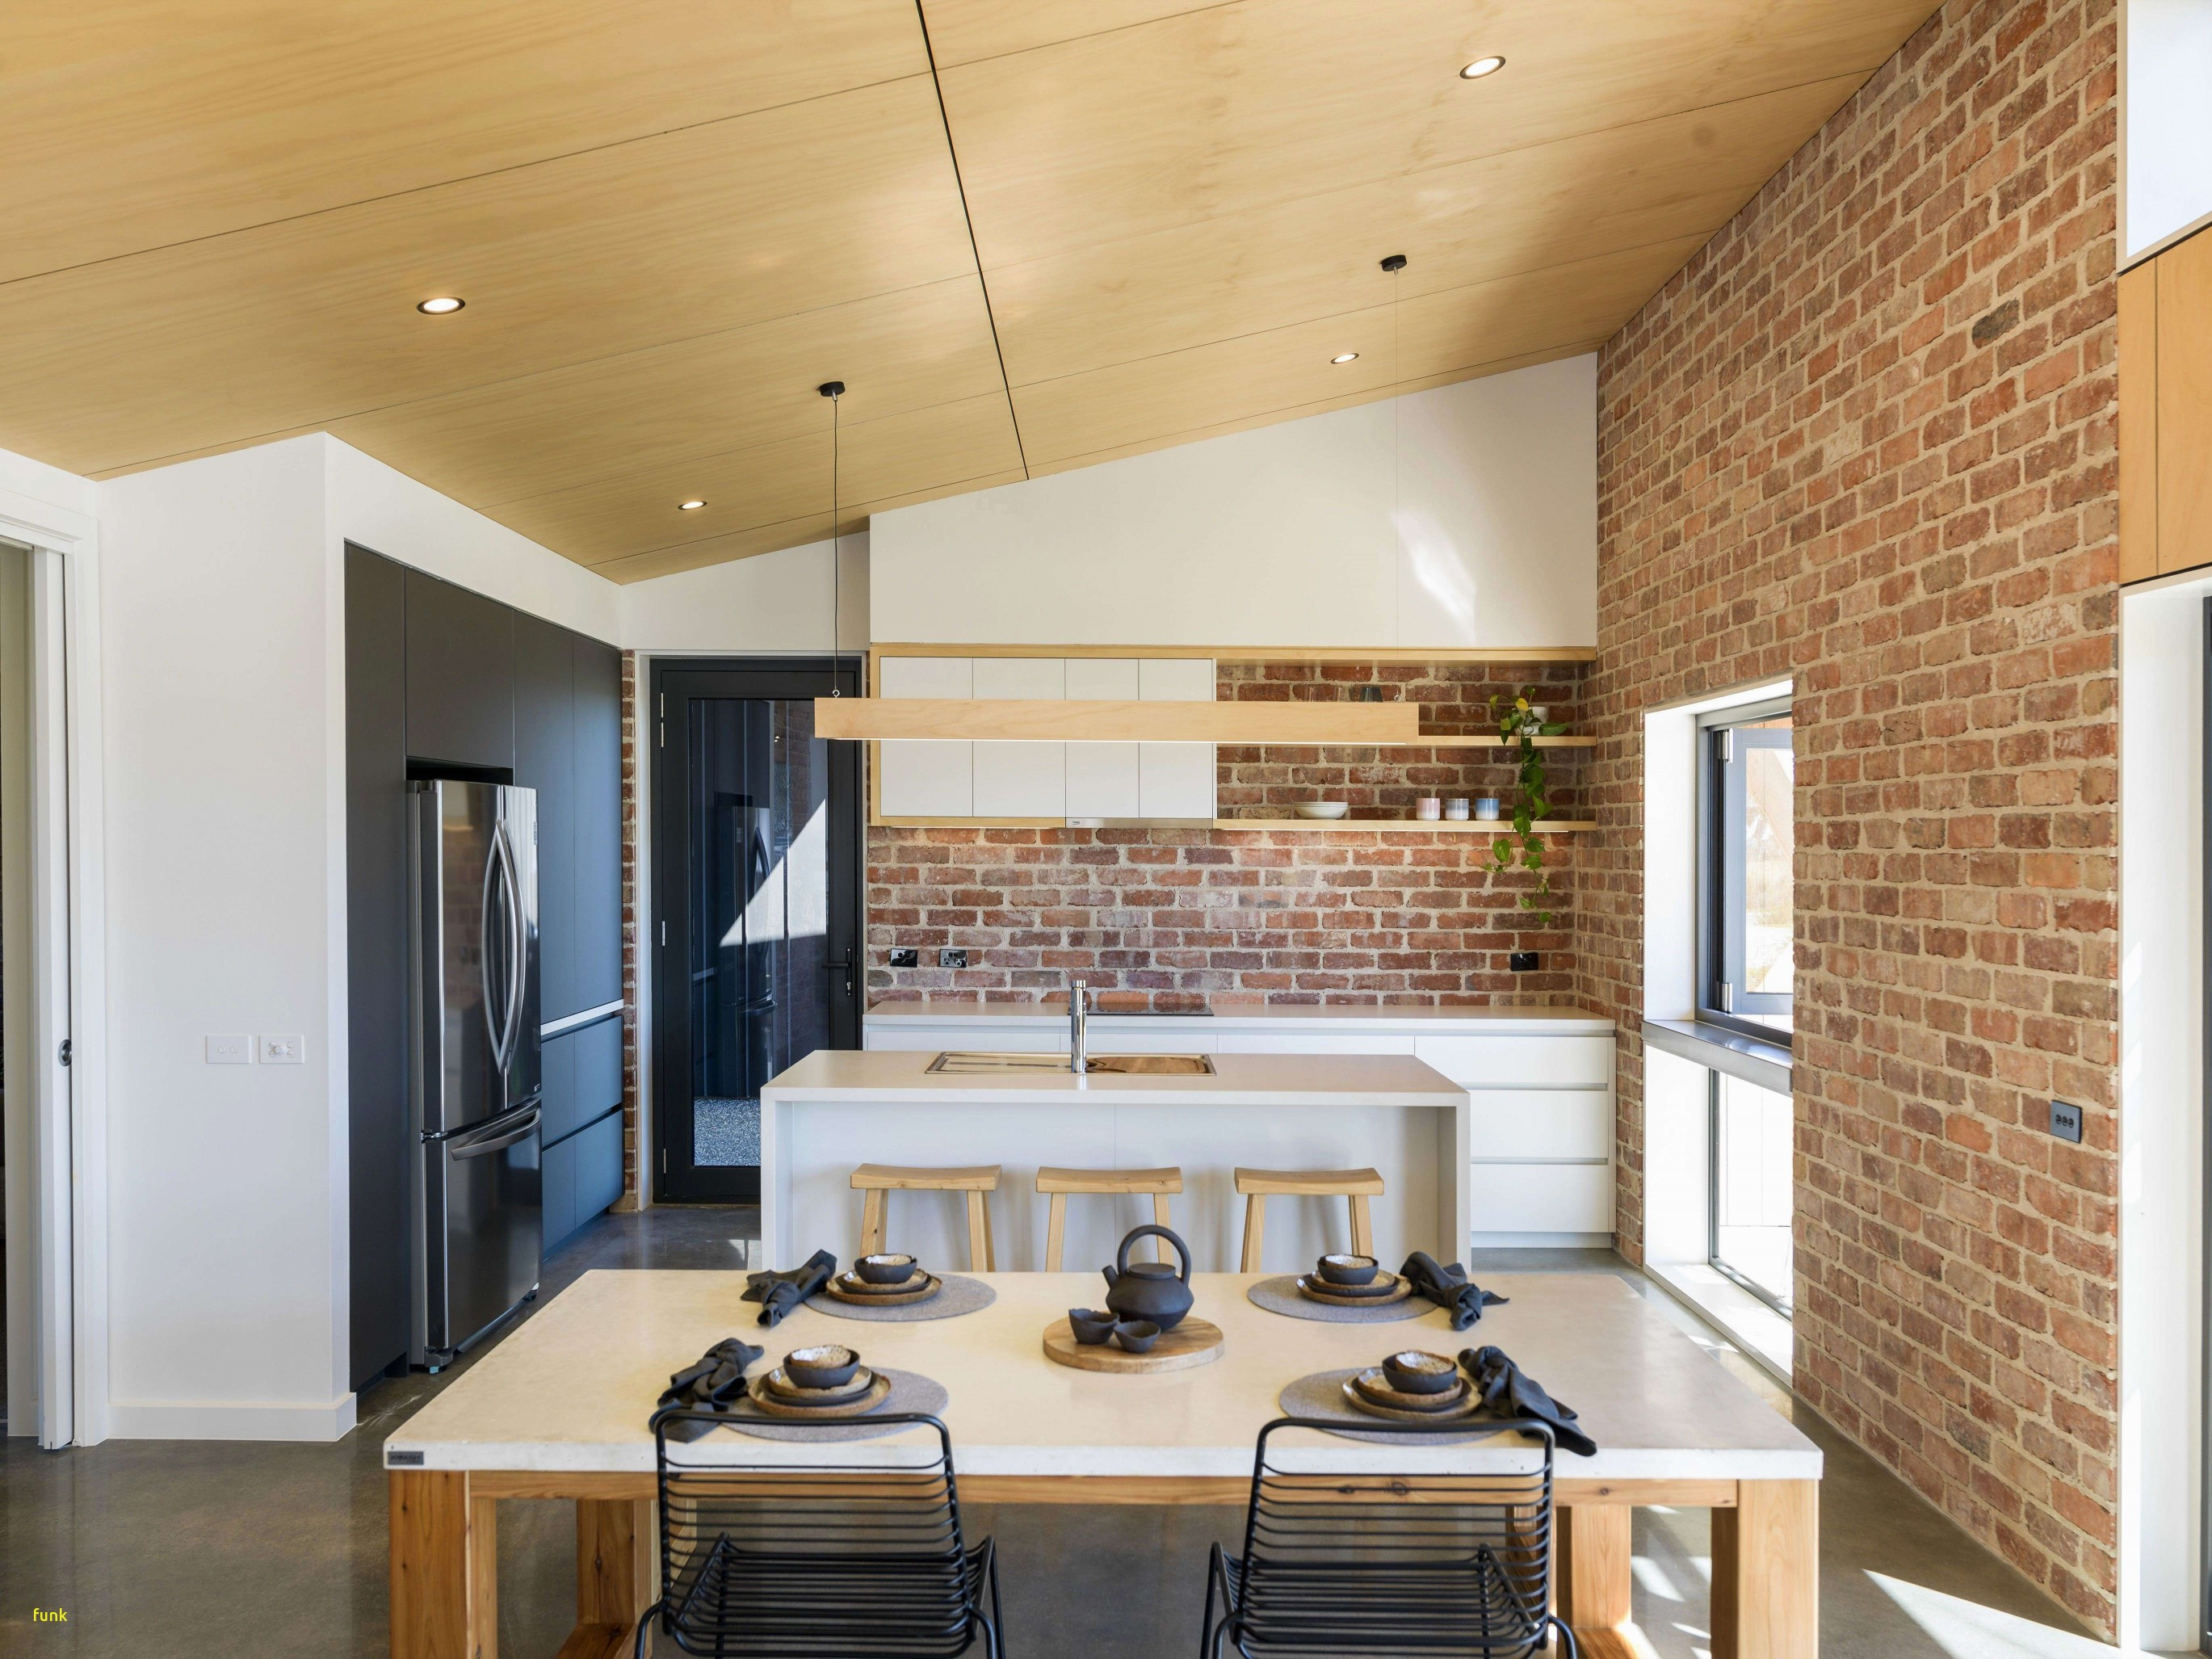 trends in hardwood flooring colors of 33 new kitchen design trends 2018 design with kitchen design trends elegant kitchen decor items new kitchen zeev kitchen zeev kitchen 0d kitchen